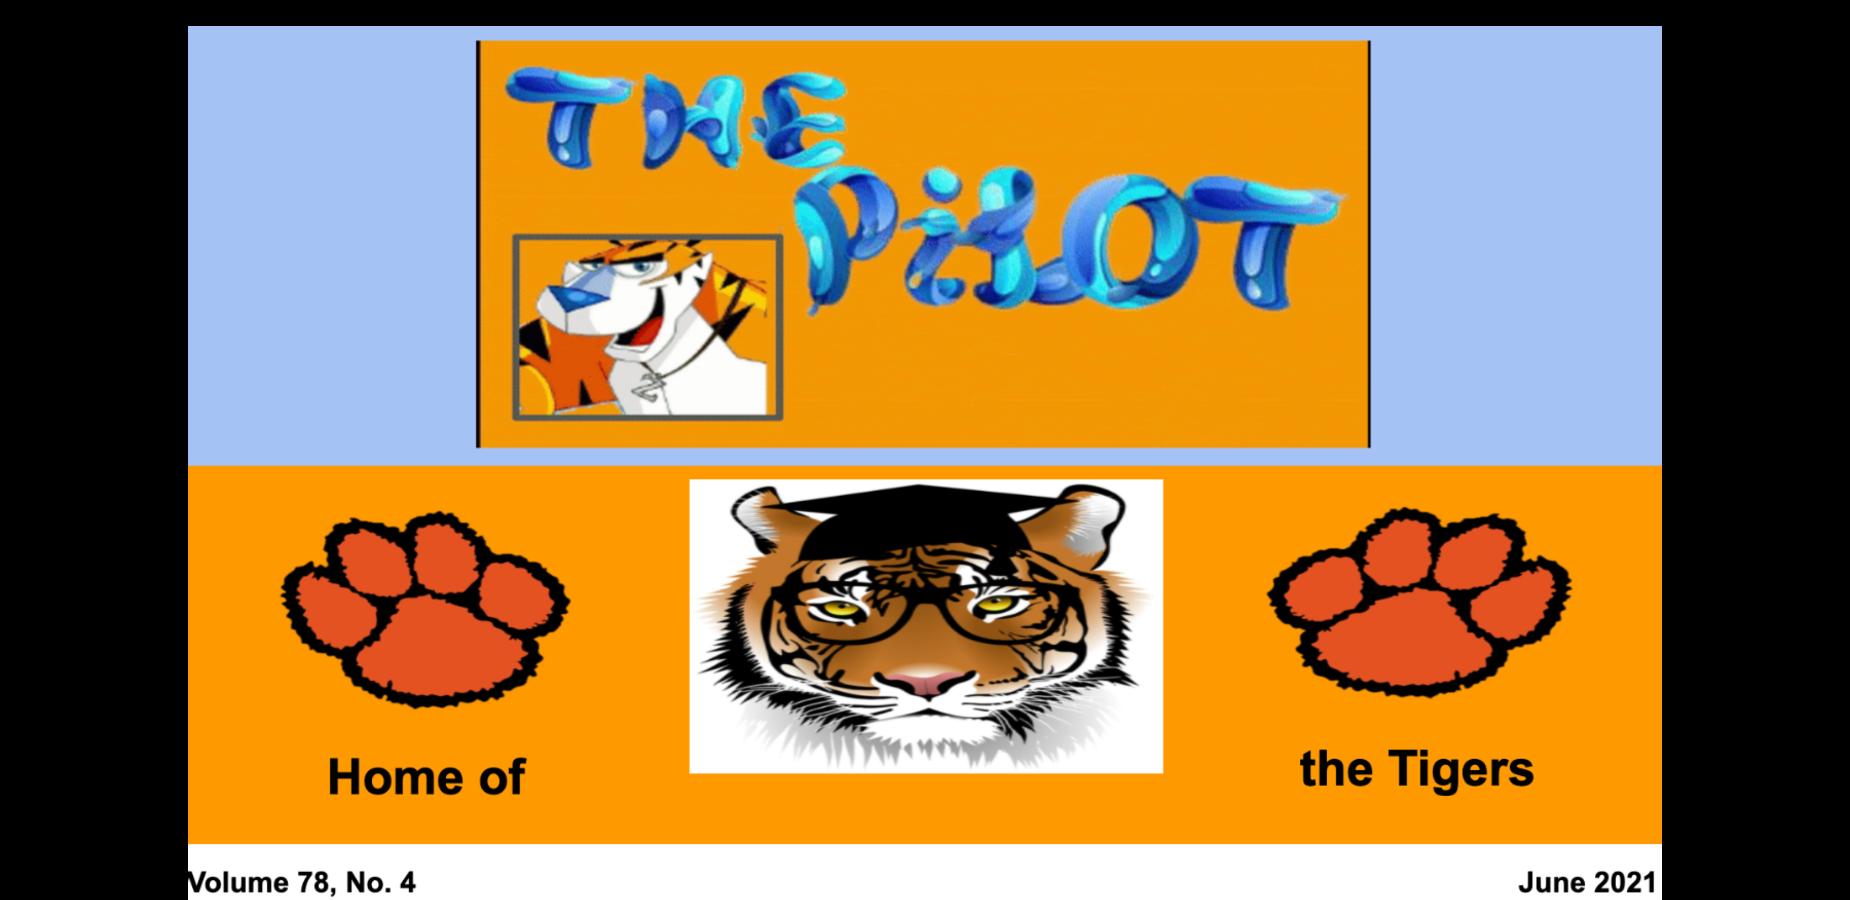 The Pilot. A cartoon tiger with sunglasses on. Tiger paws on both sides of a tiger with glasses and a graduation cap